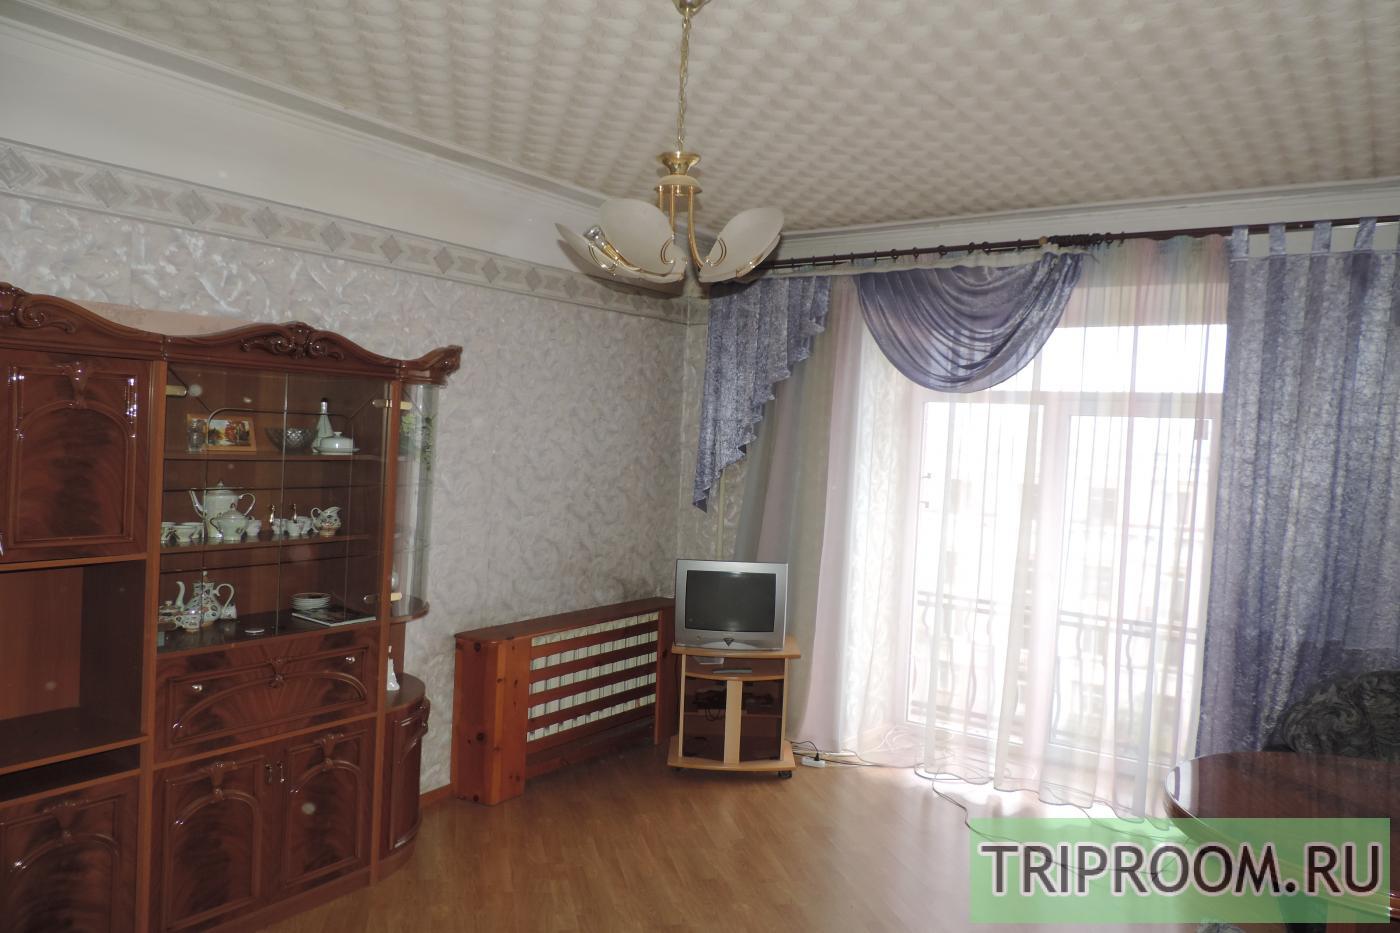 2-комнатная квартира посуточно (вариант № 11543), ул. Цвиллинга улица, фото № 3